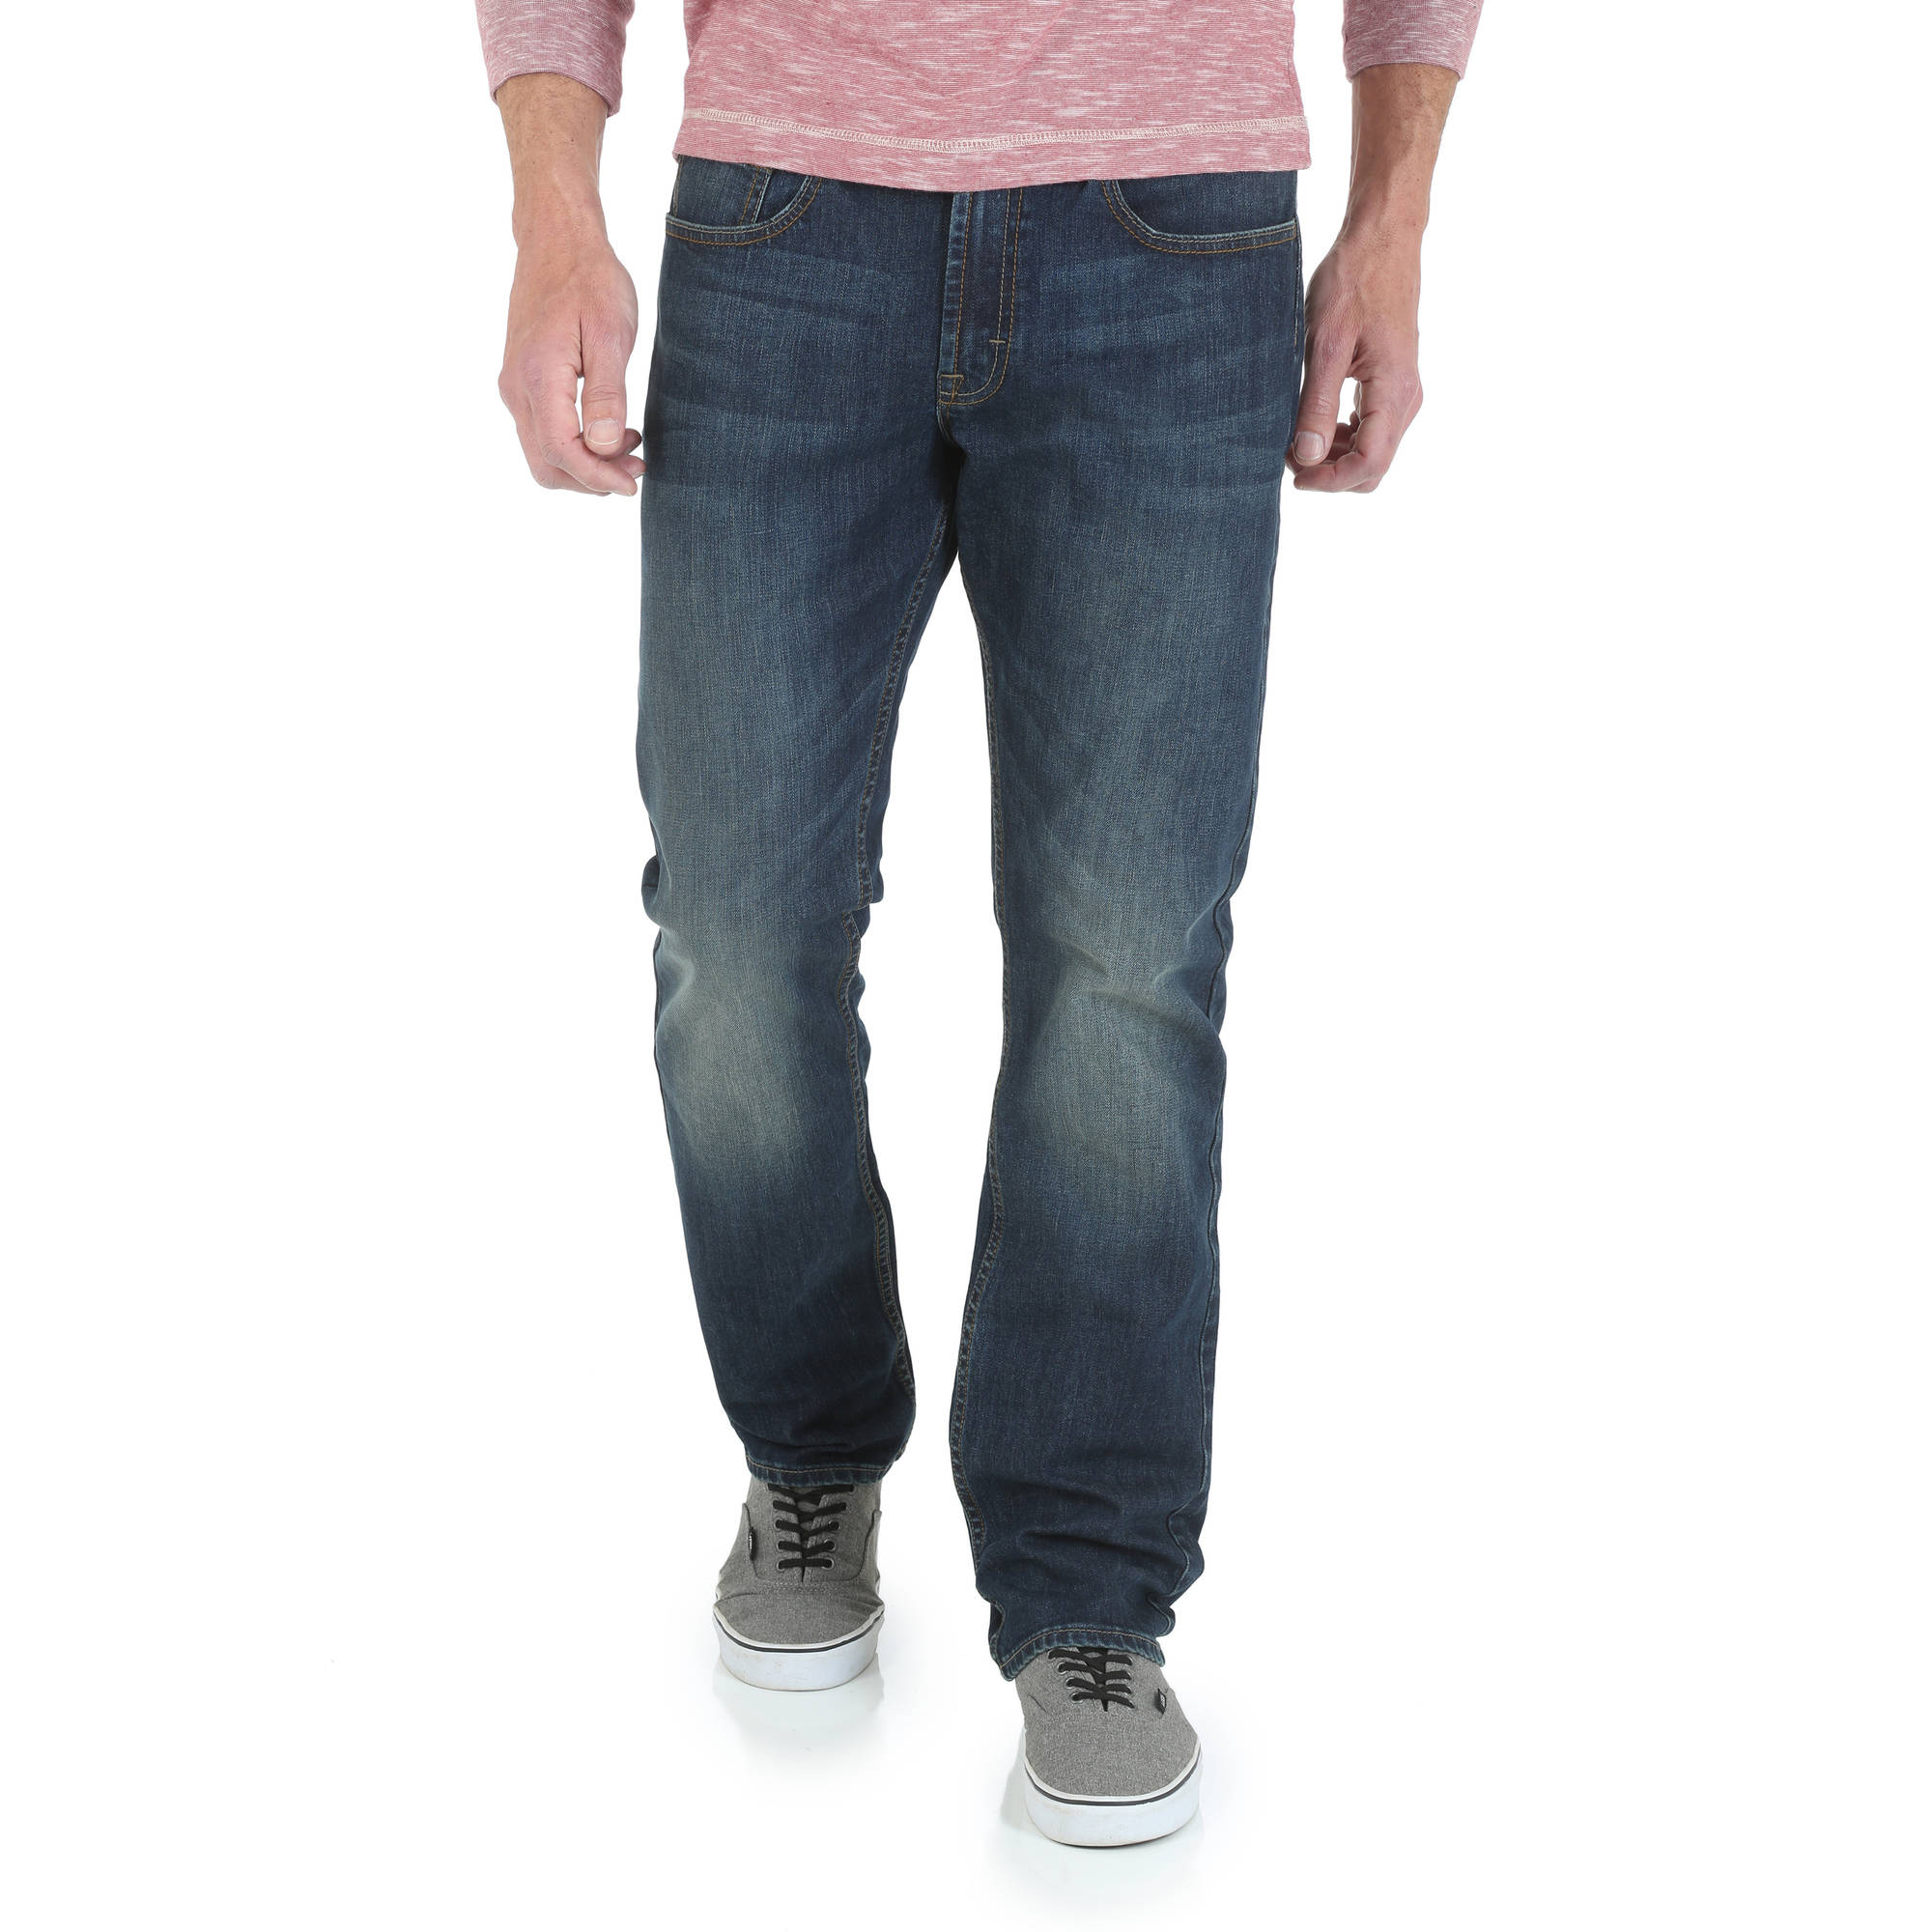 Slim straight jeans walmart